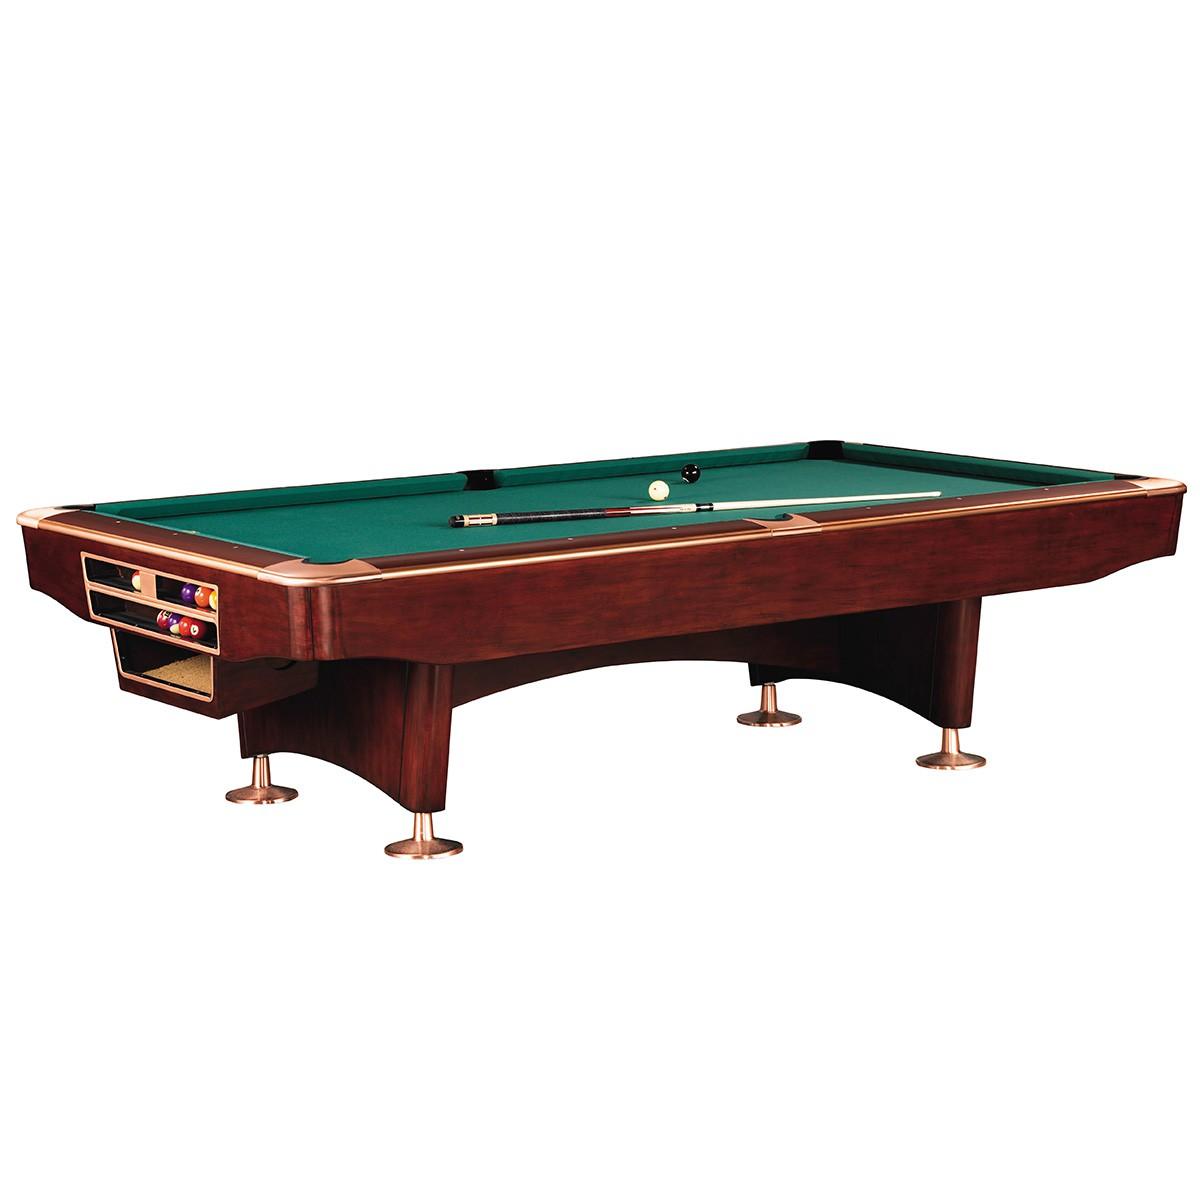 9 ft profi pool billardtisch billiardtisch billard modell for 9 ft garden pool